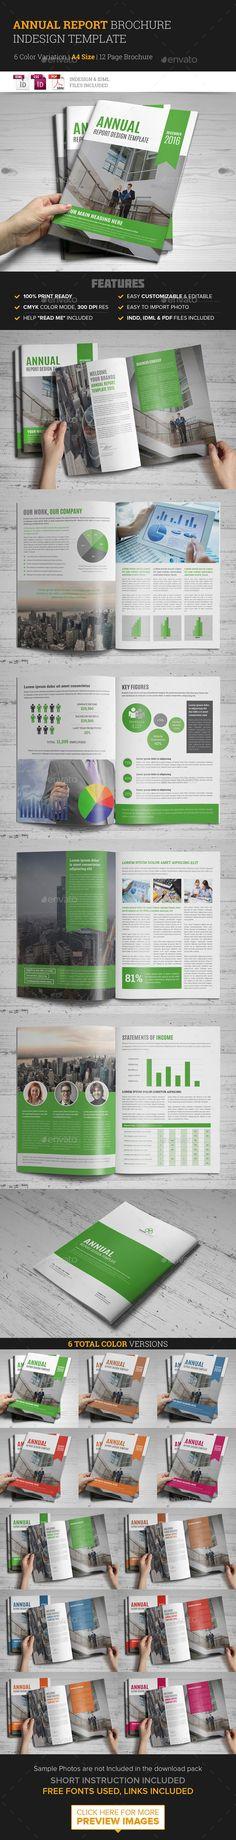 Annual Report Brochure Indesign Template - Corporate Brochures